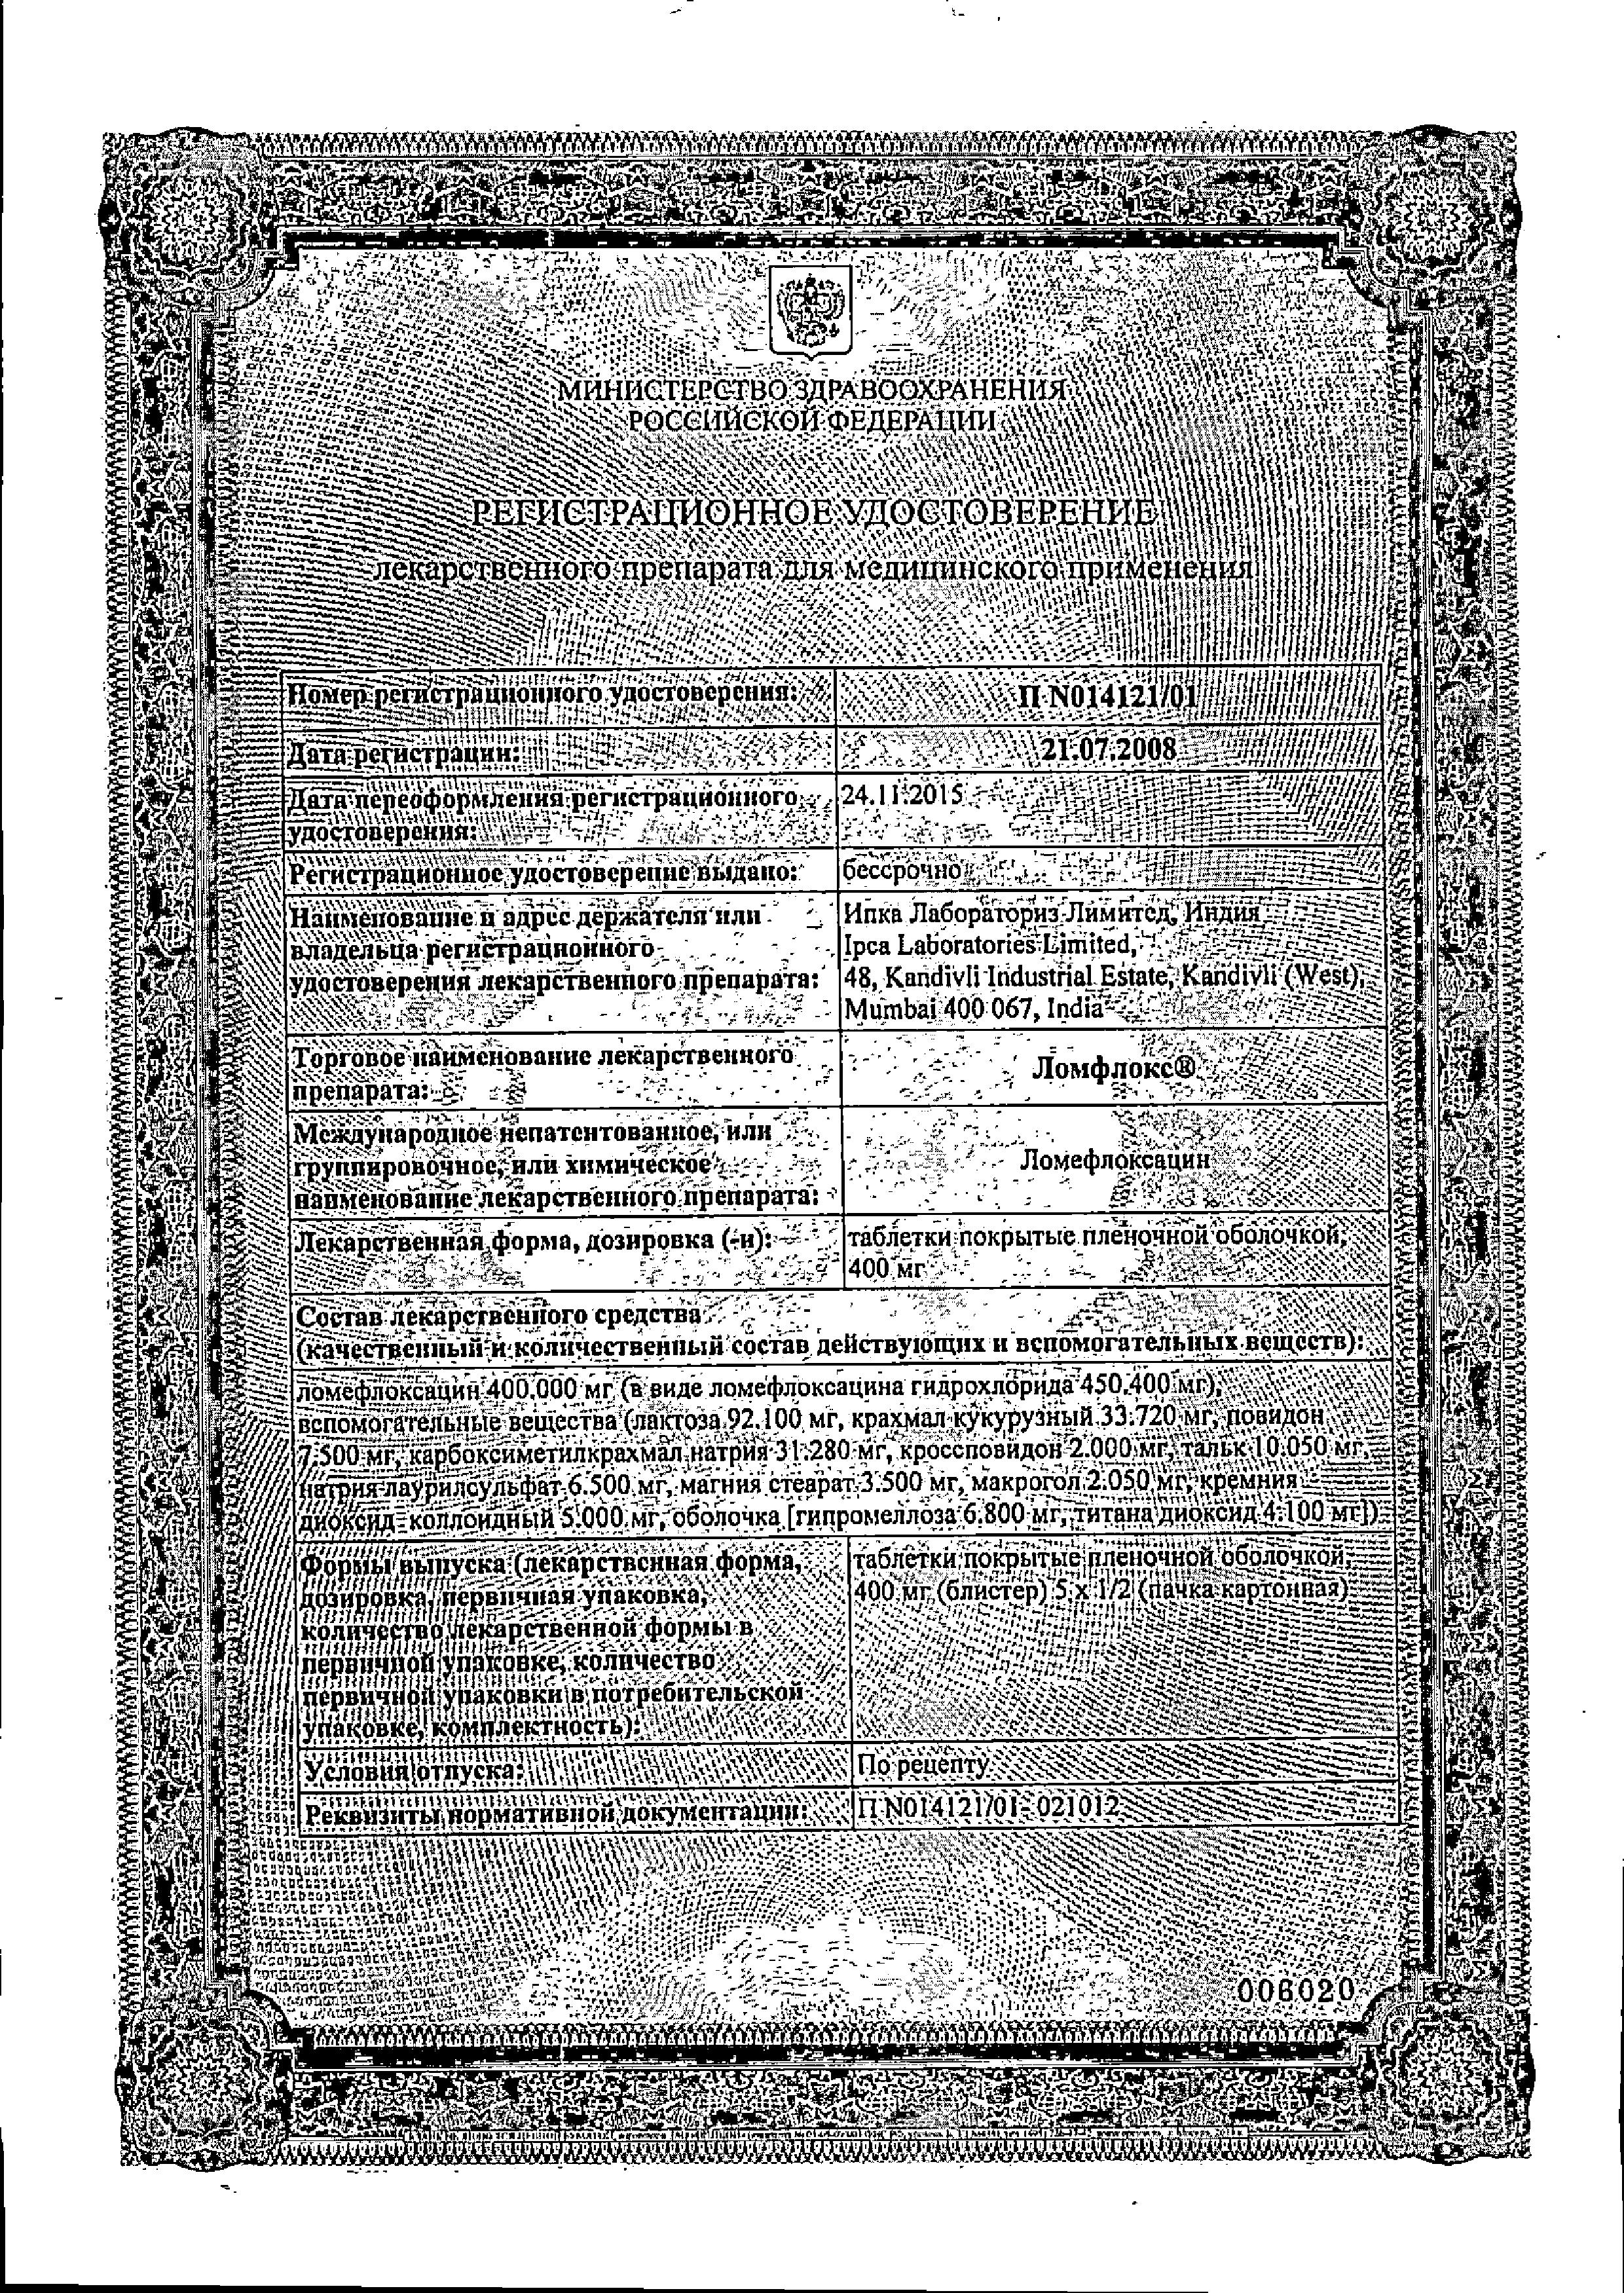 Ломфлокс сертификат